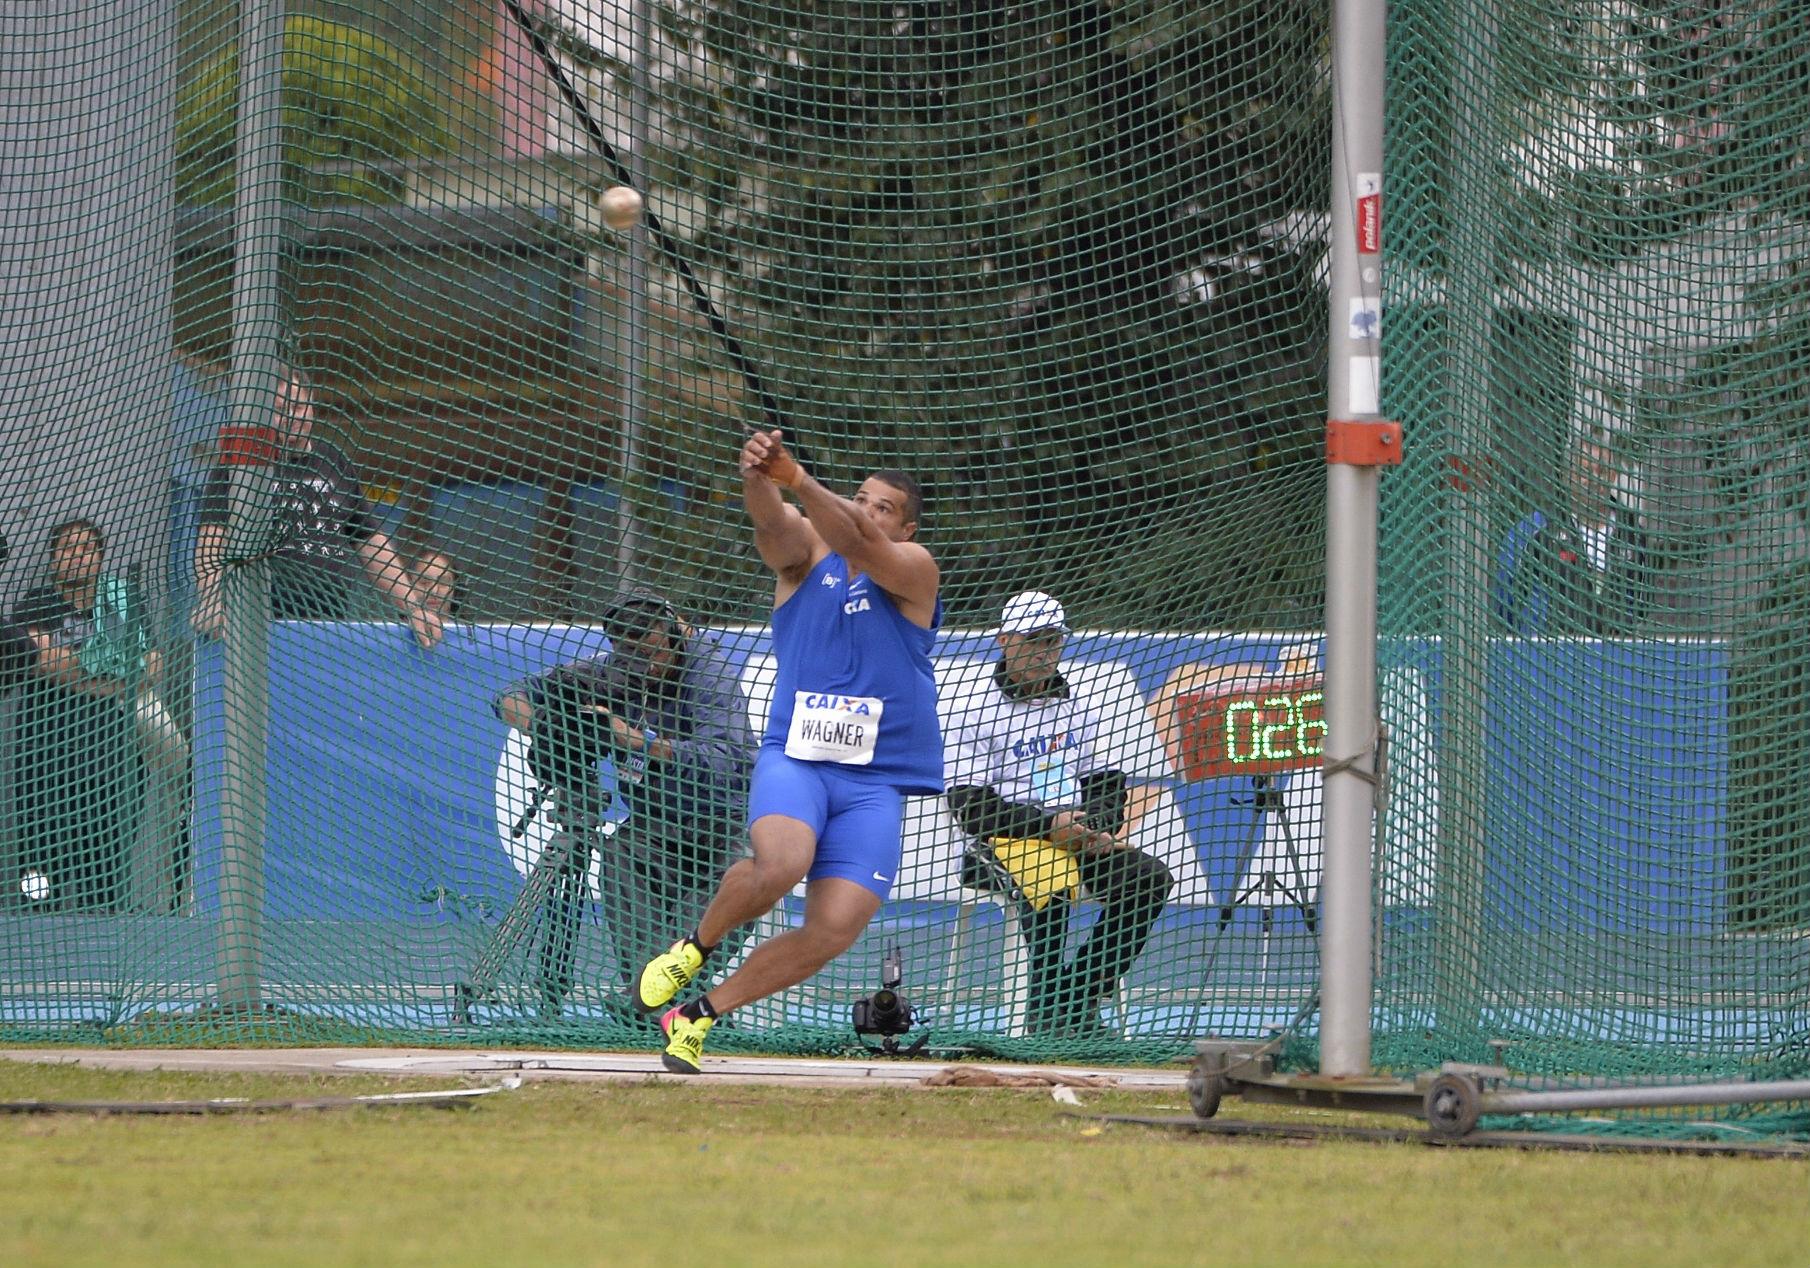 Foto: Osvaldo F./B3 Atletismo